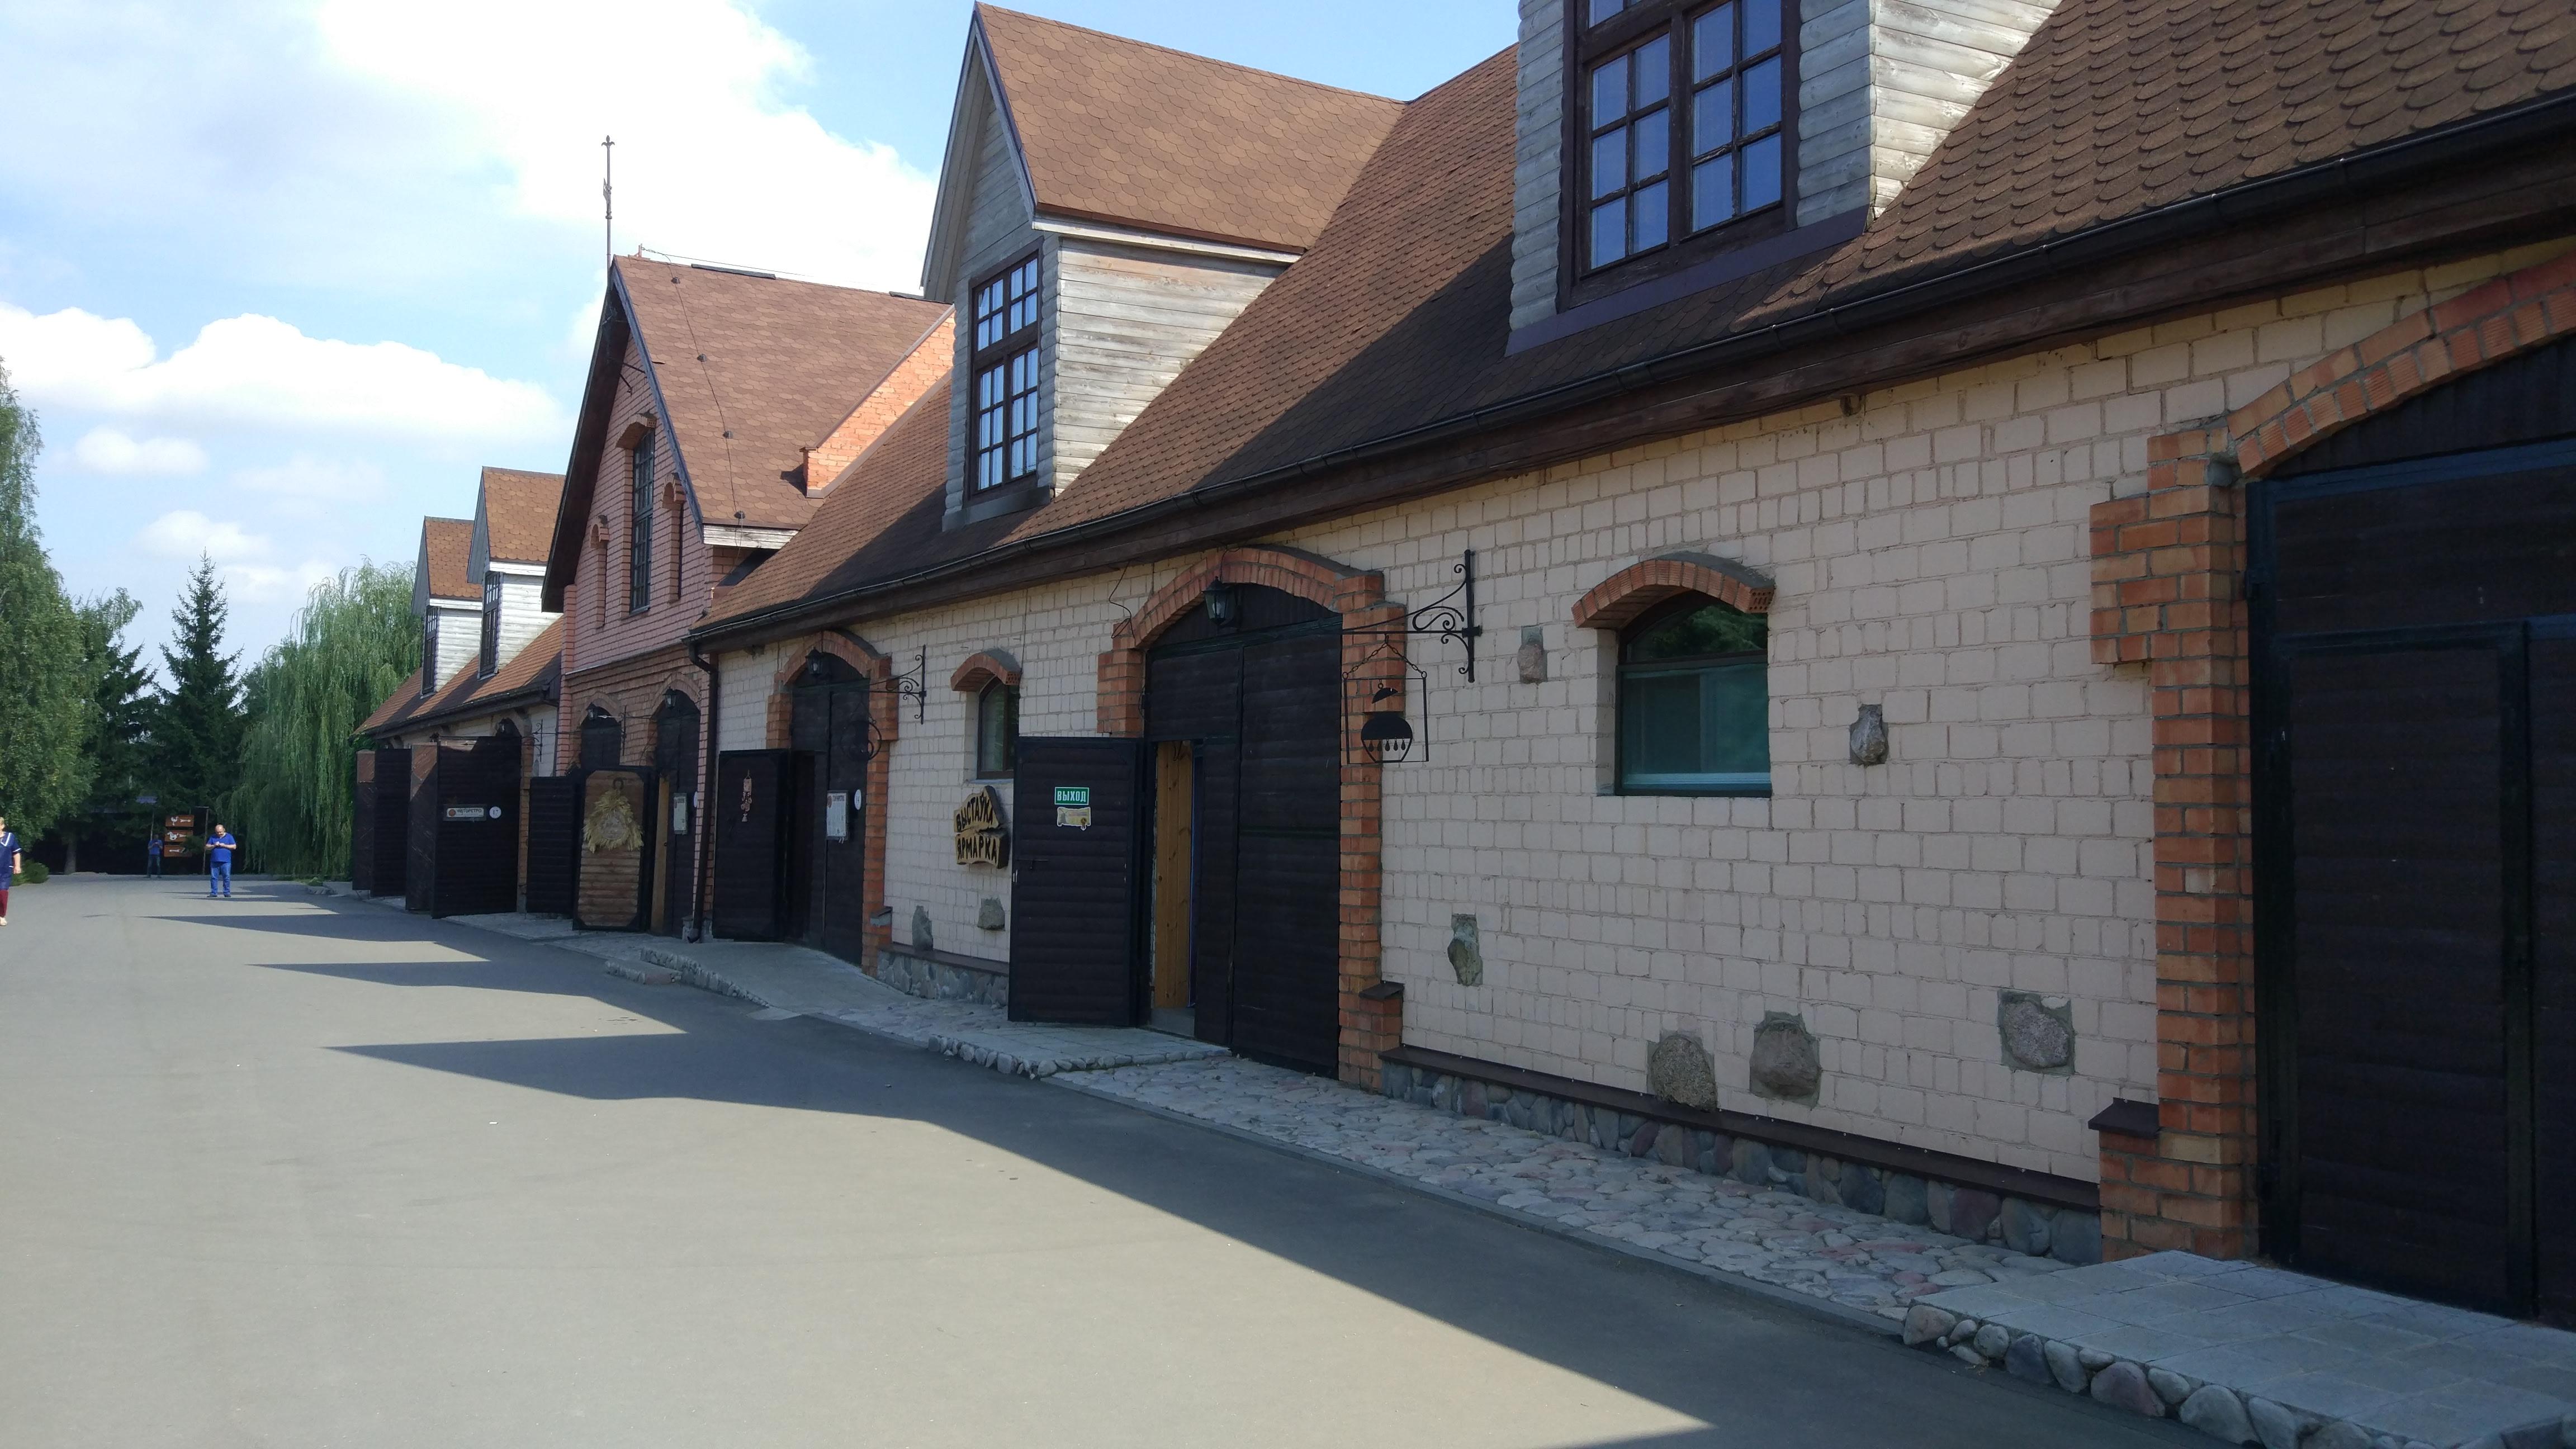 Stroll around Dudutki Museum